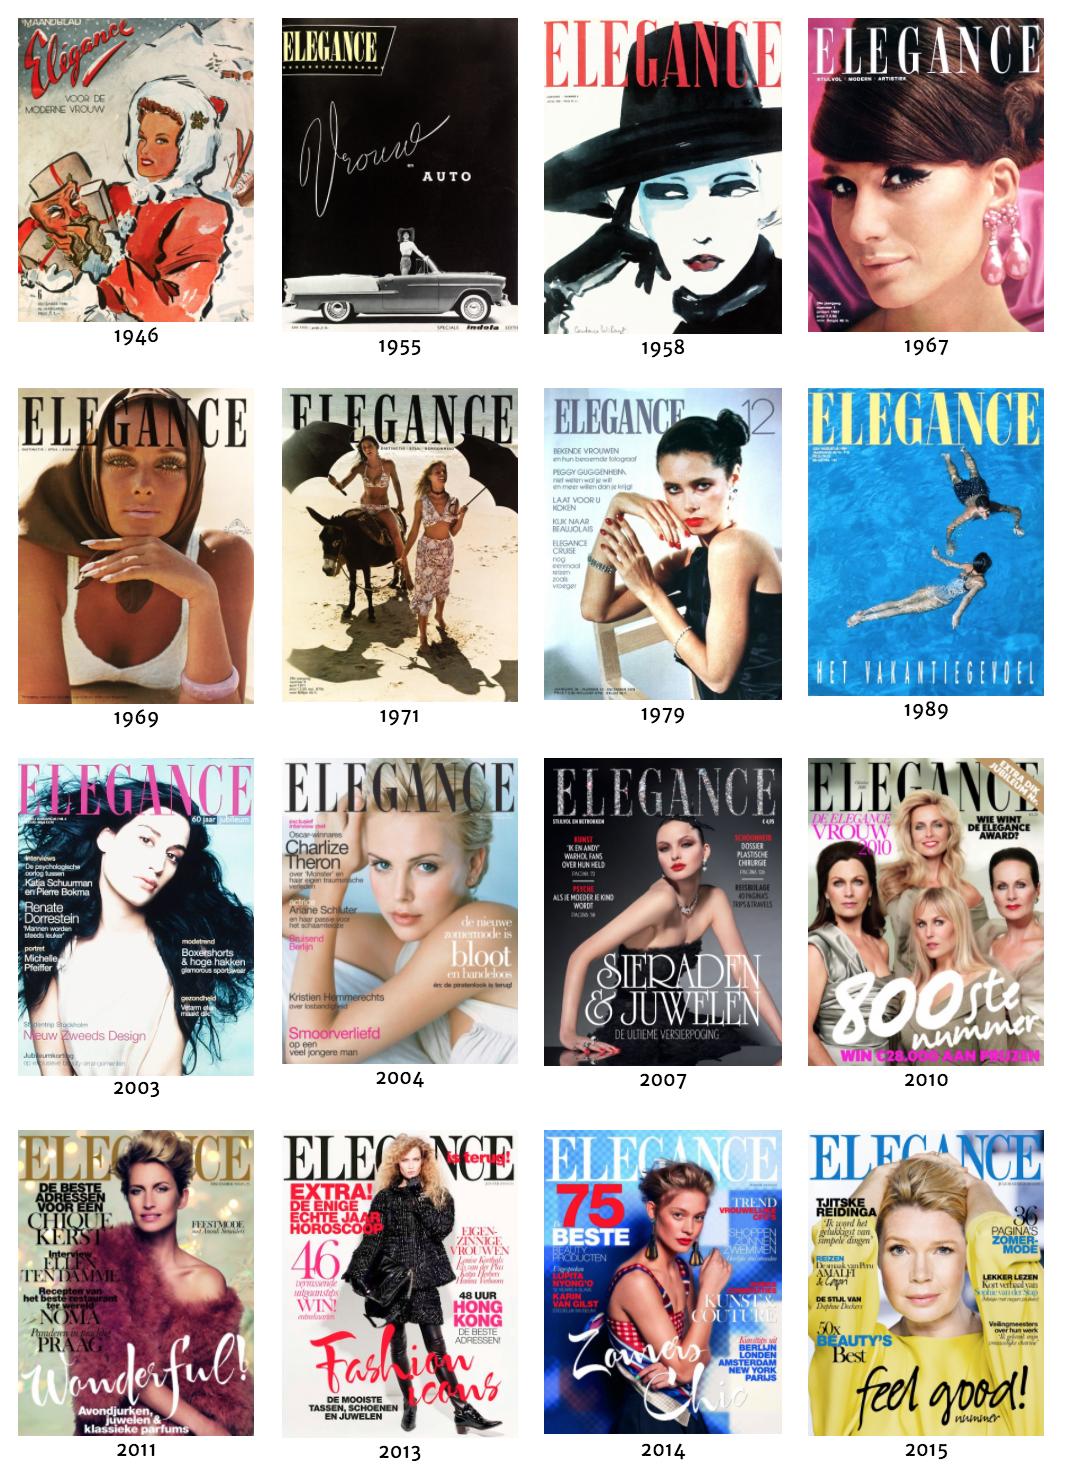 Elegance covers